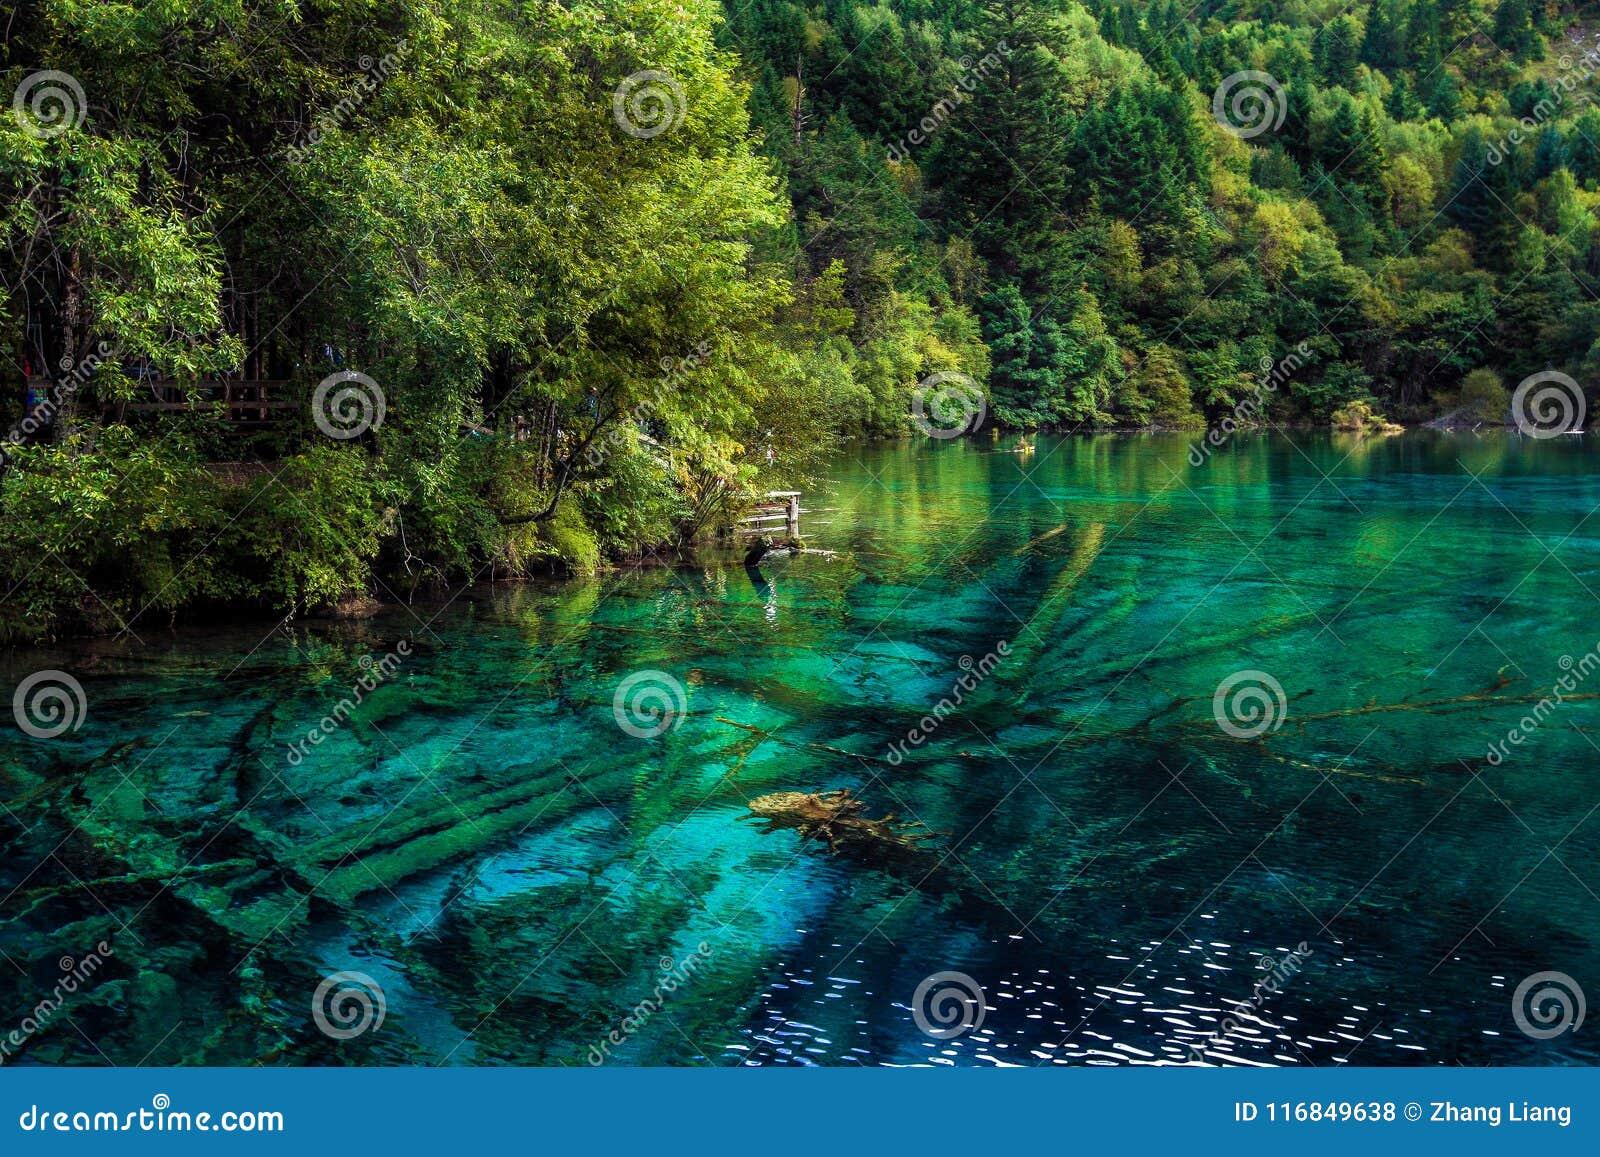 Sjö och träd i Jiuzhaigou Valley, Sichuan, Kina